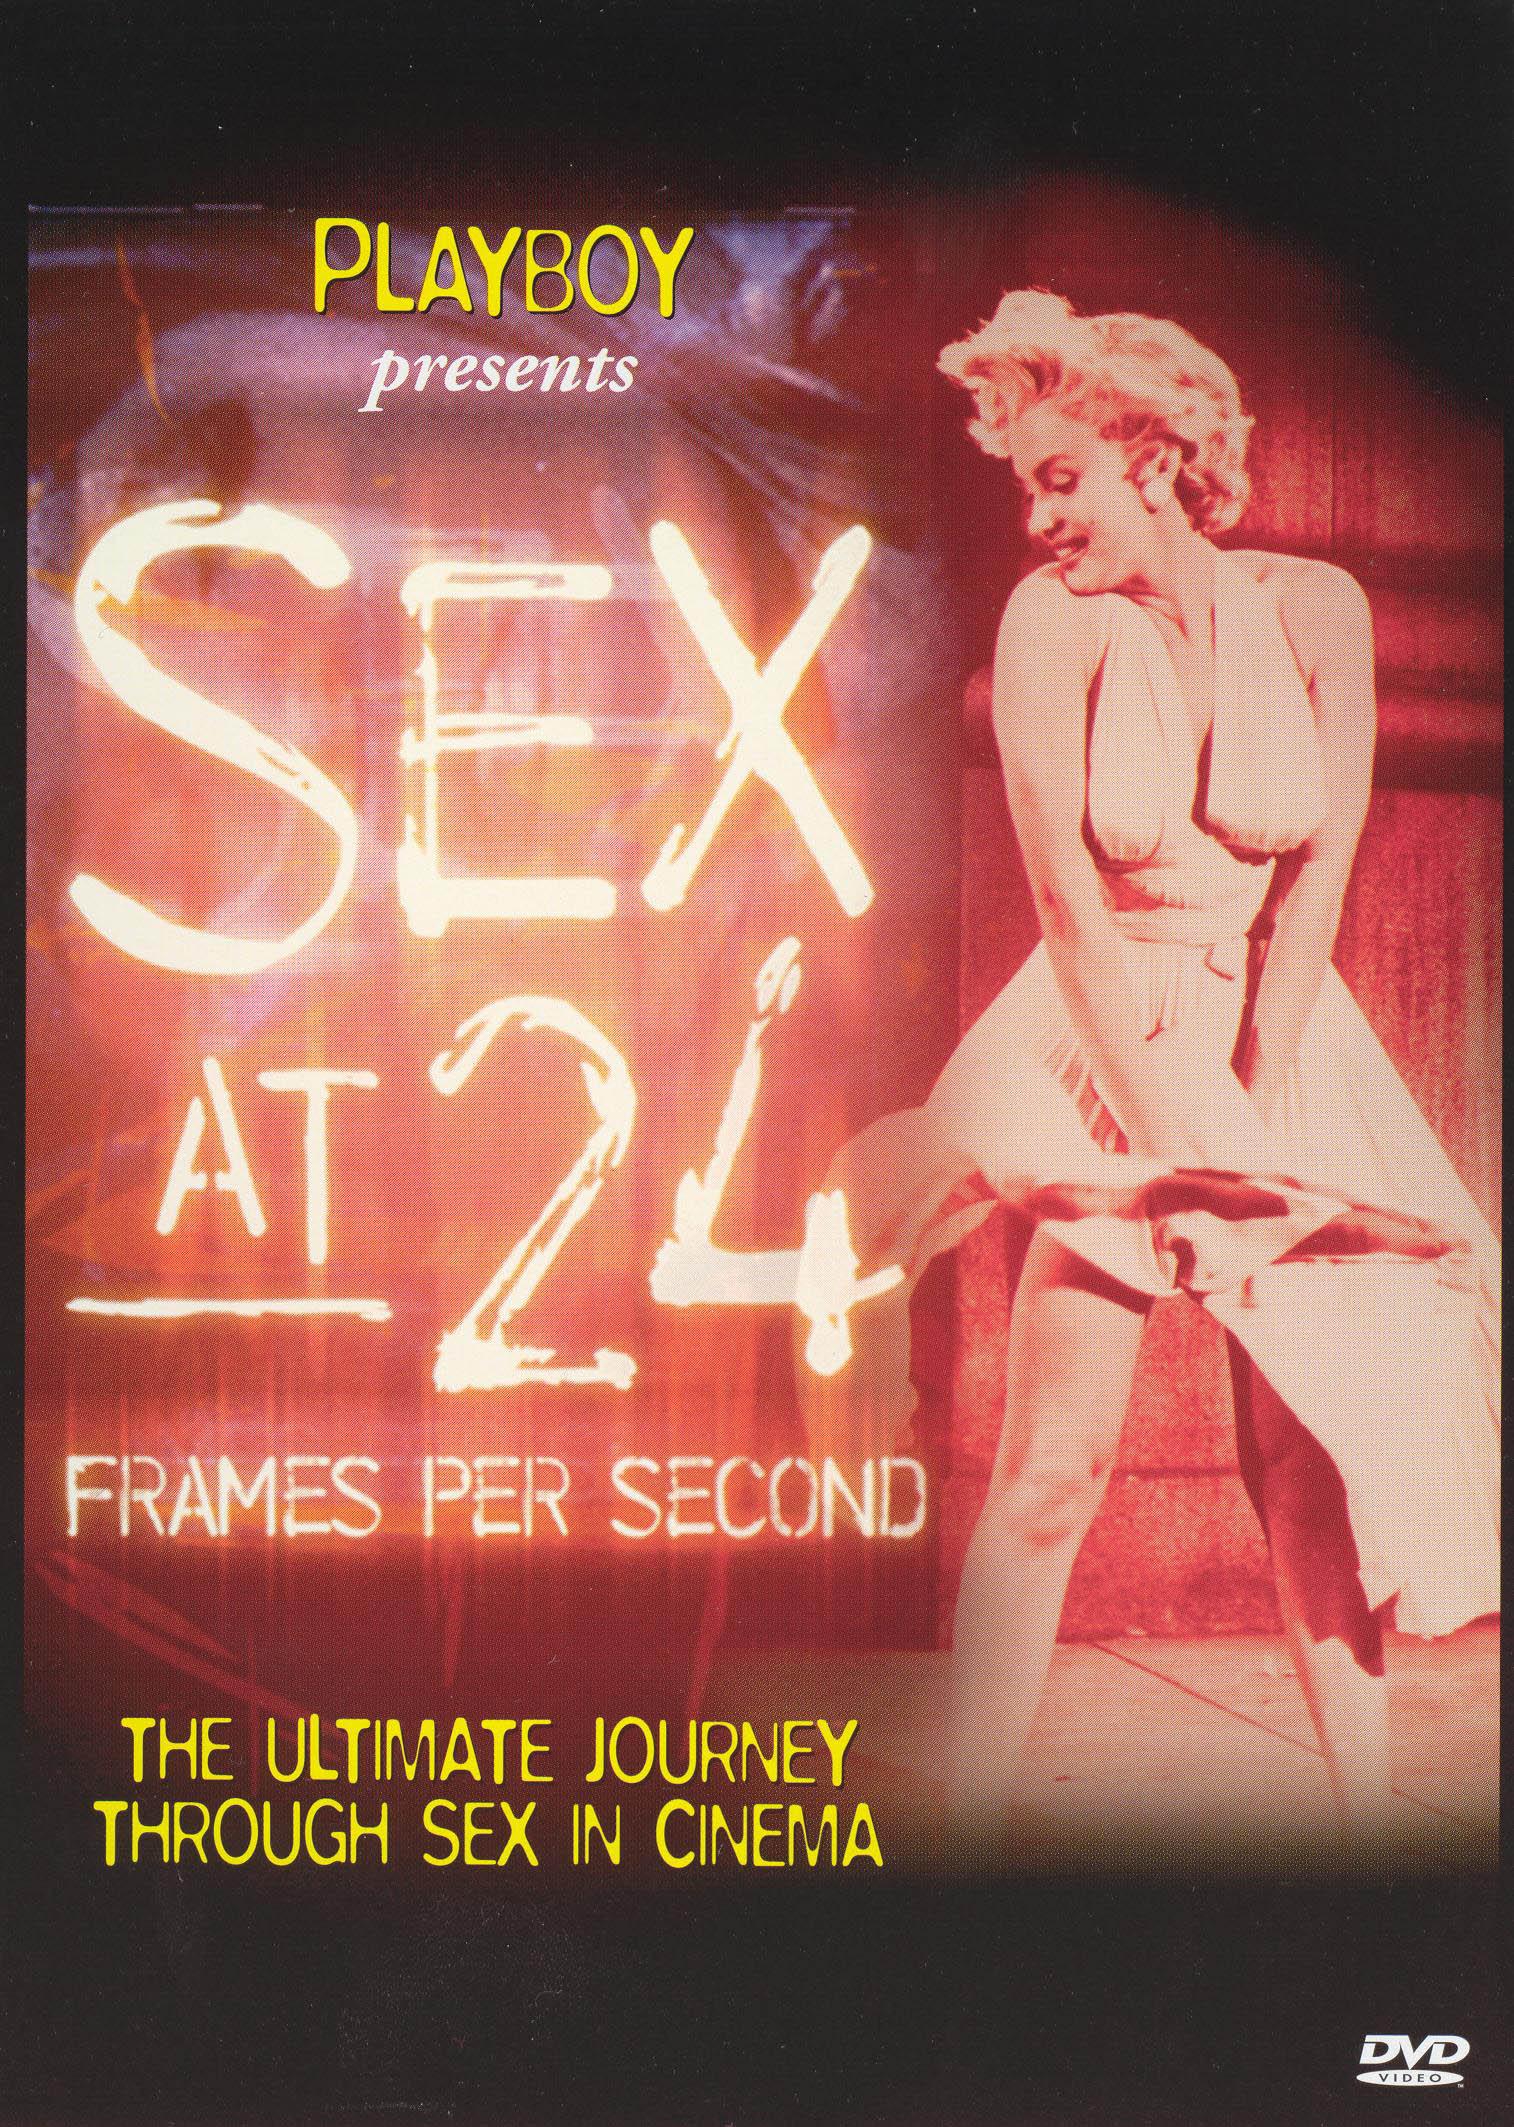 Playboy: Sex at 24 Frames Per Second